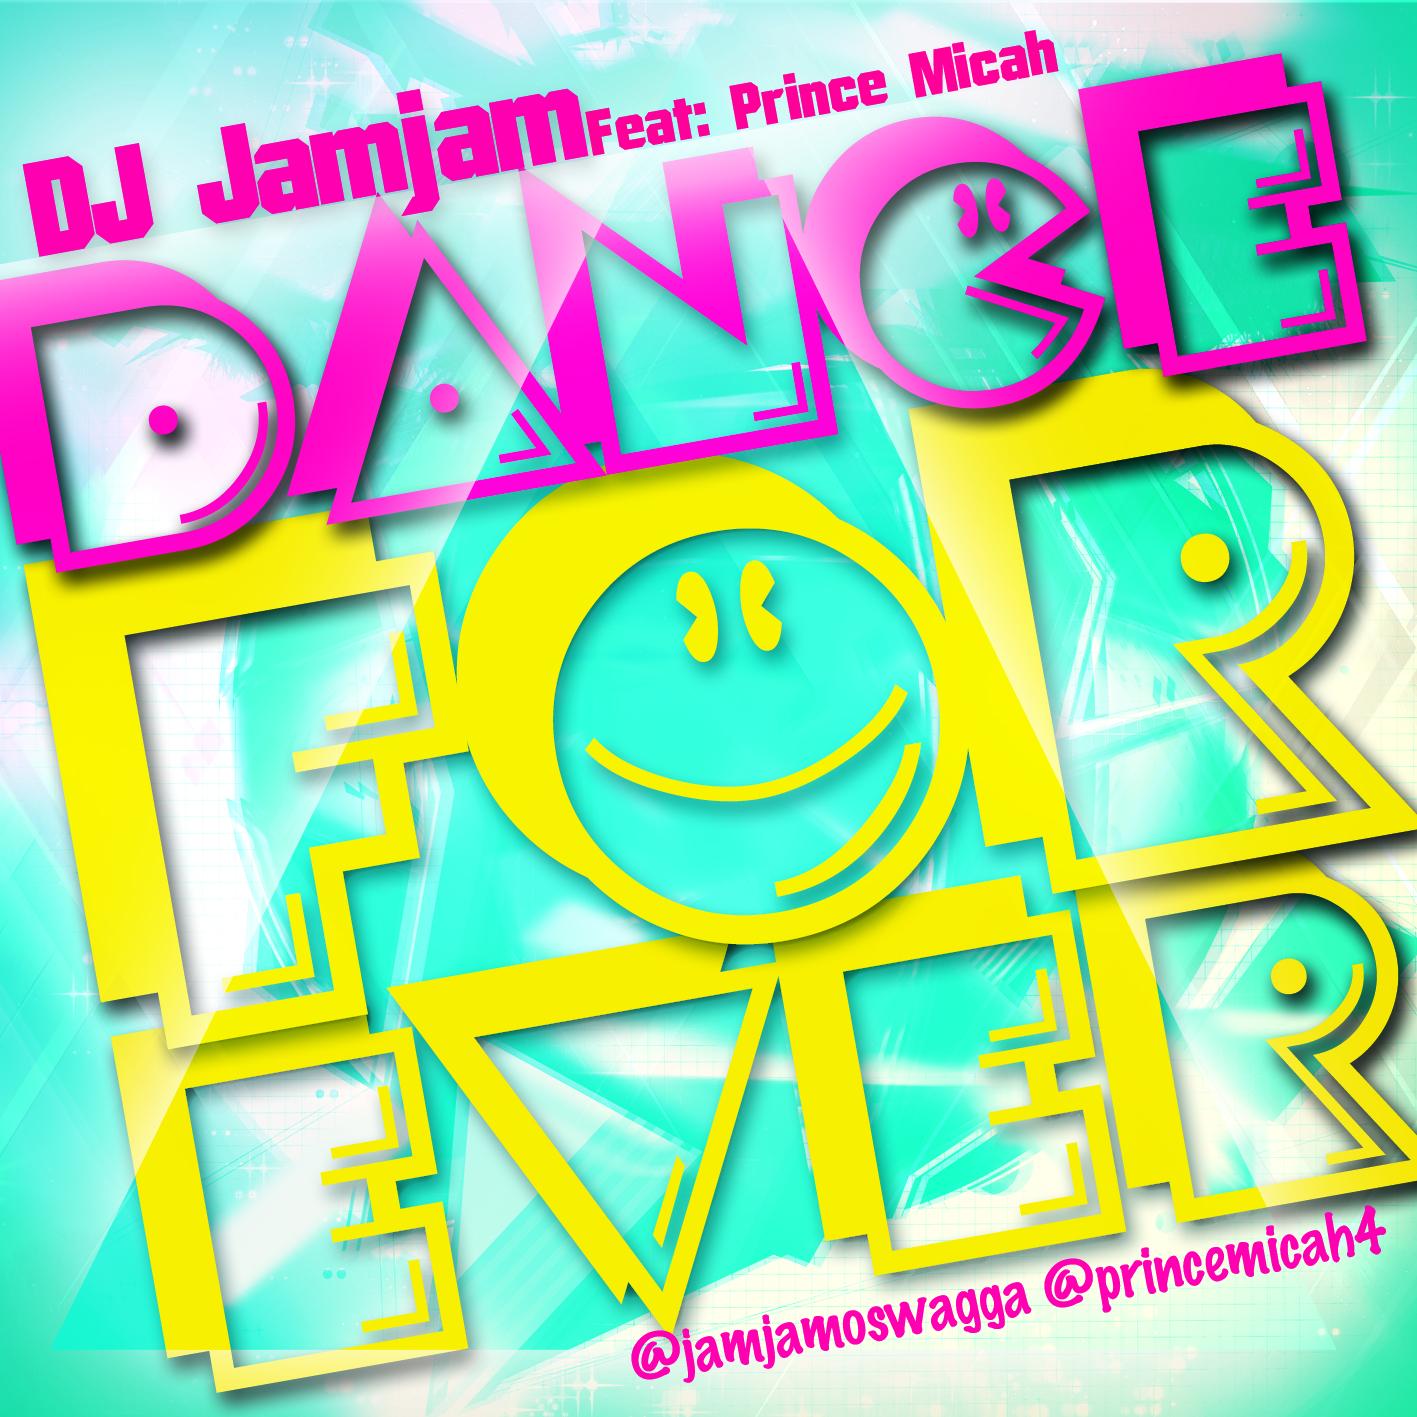 Dj JamJam - Dance Forever ft prince micah [waploaded.com].mp3